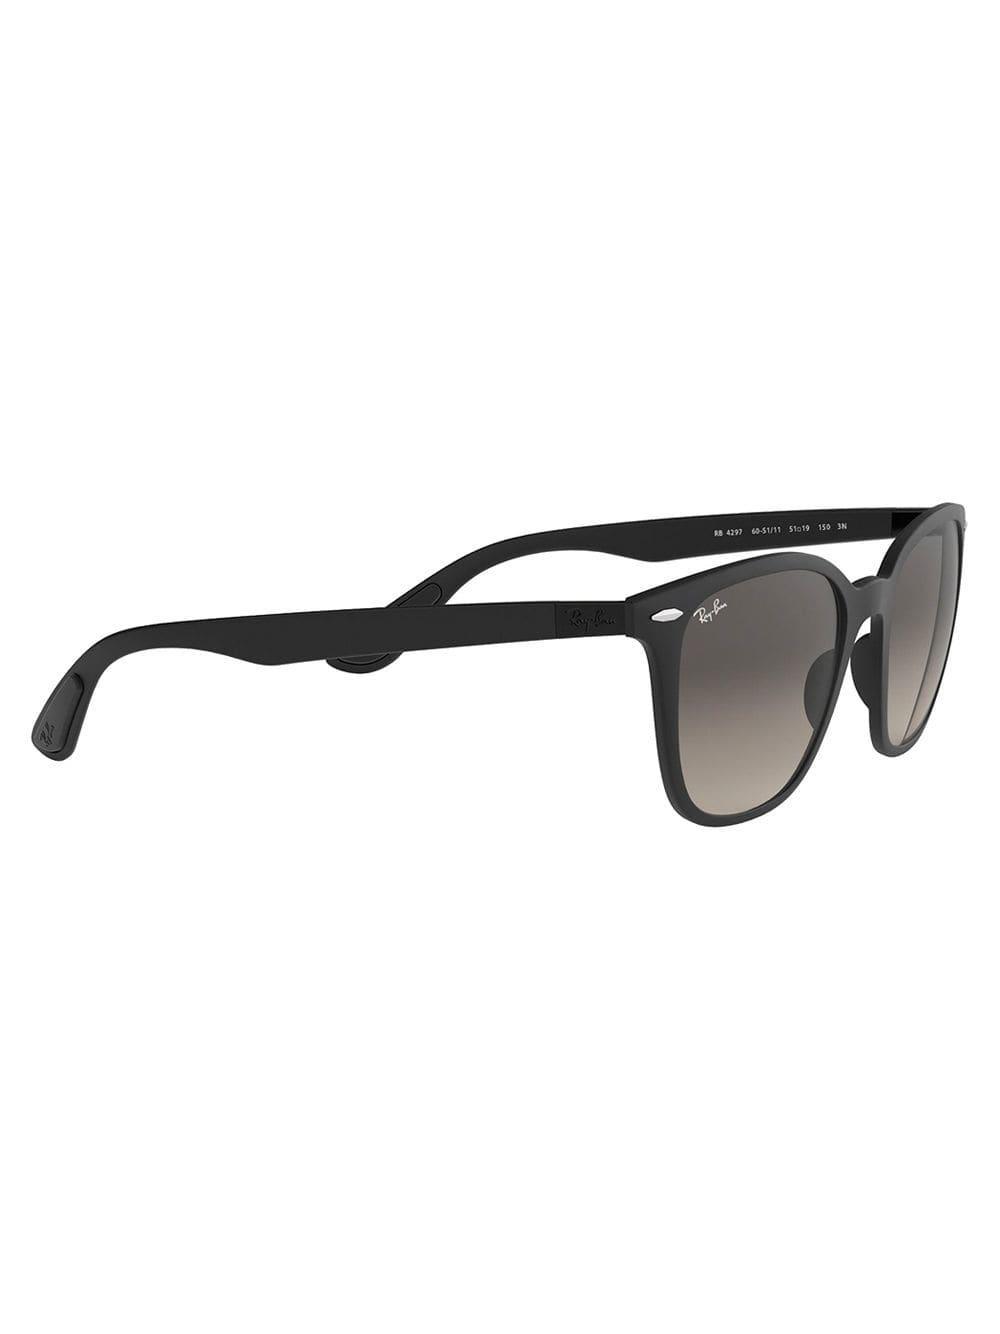 cf224137abc Ray-Ban - Black Classic Sunglasses for Men - Lyst. View fullscreen